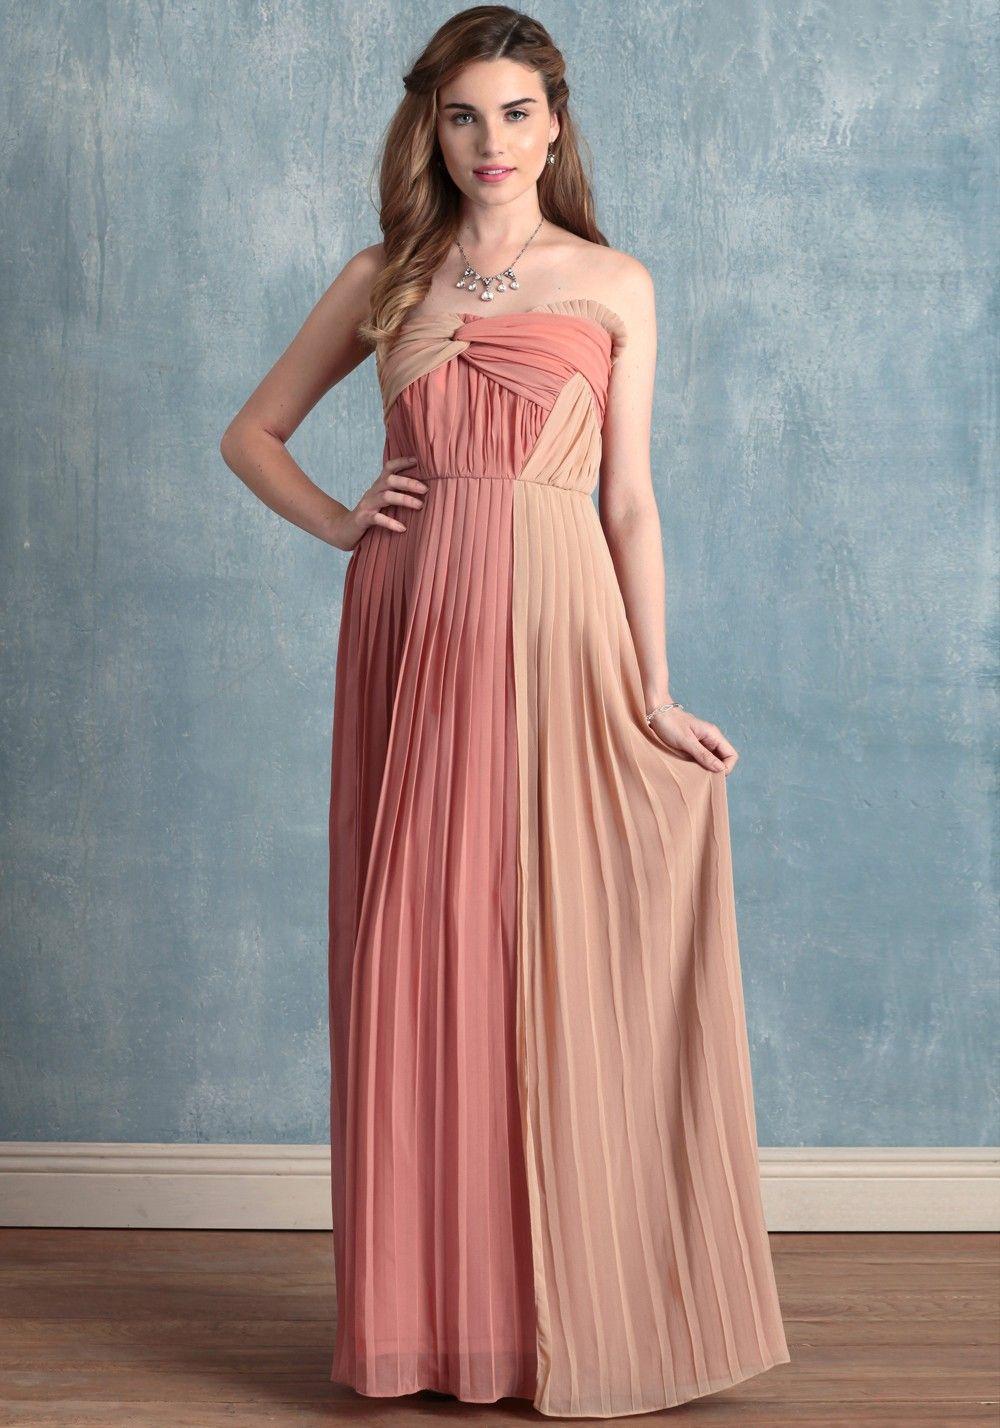 Modern vintage wedding dresses  Celosia Pink Dress  Modern Vintage Curvy Plus Dresses  Modern